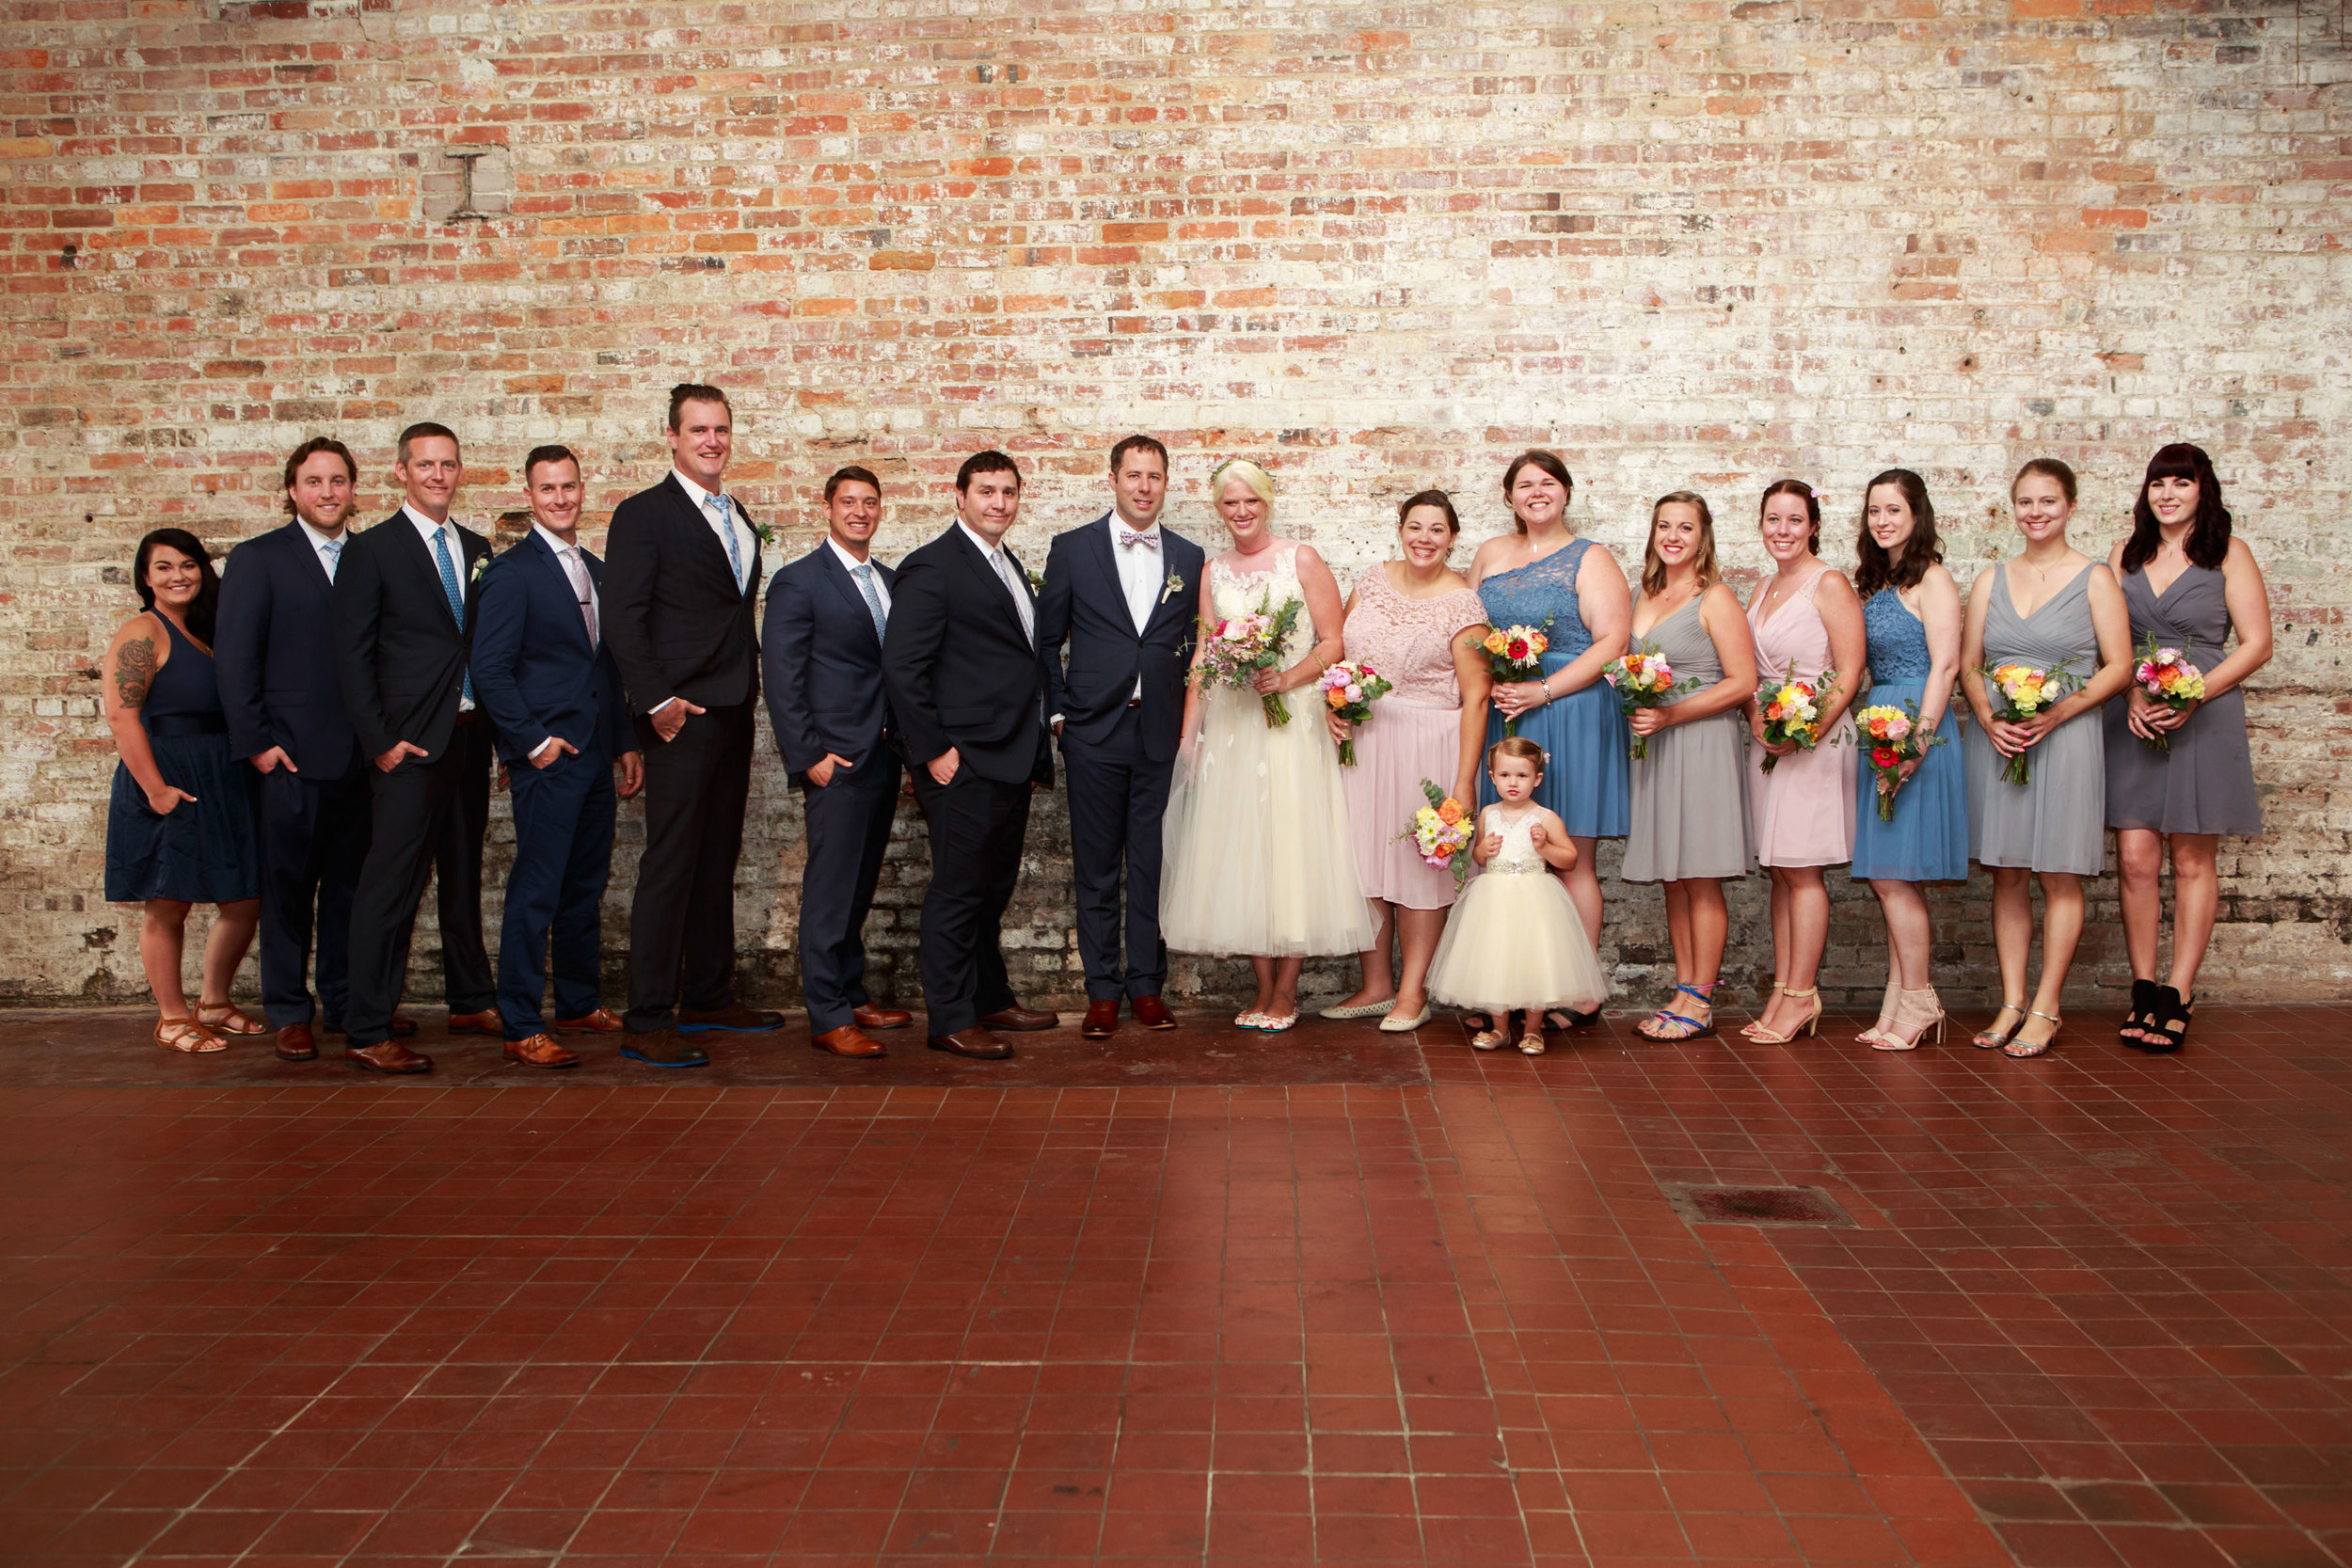 128-South-Wedding-Tiffany-Abruzzo-Photography-Group-13.jpg